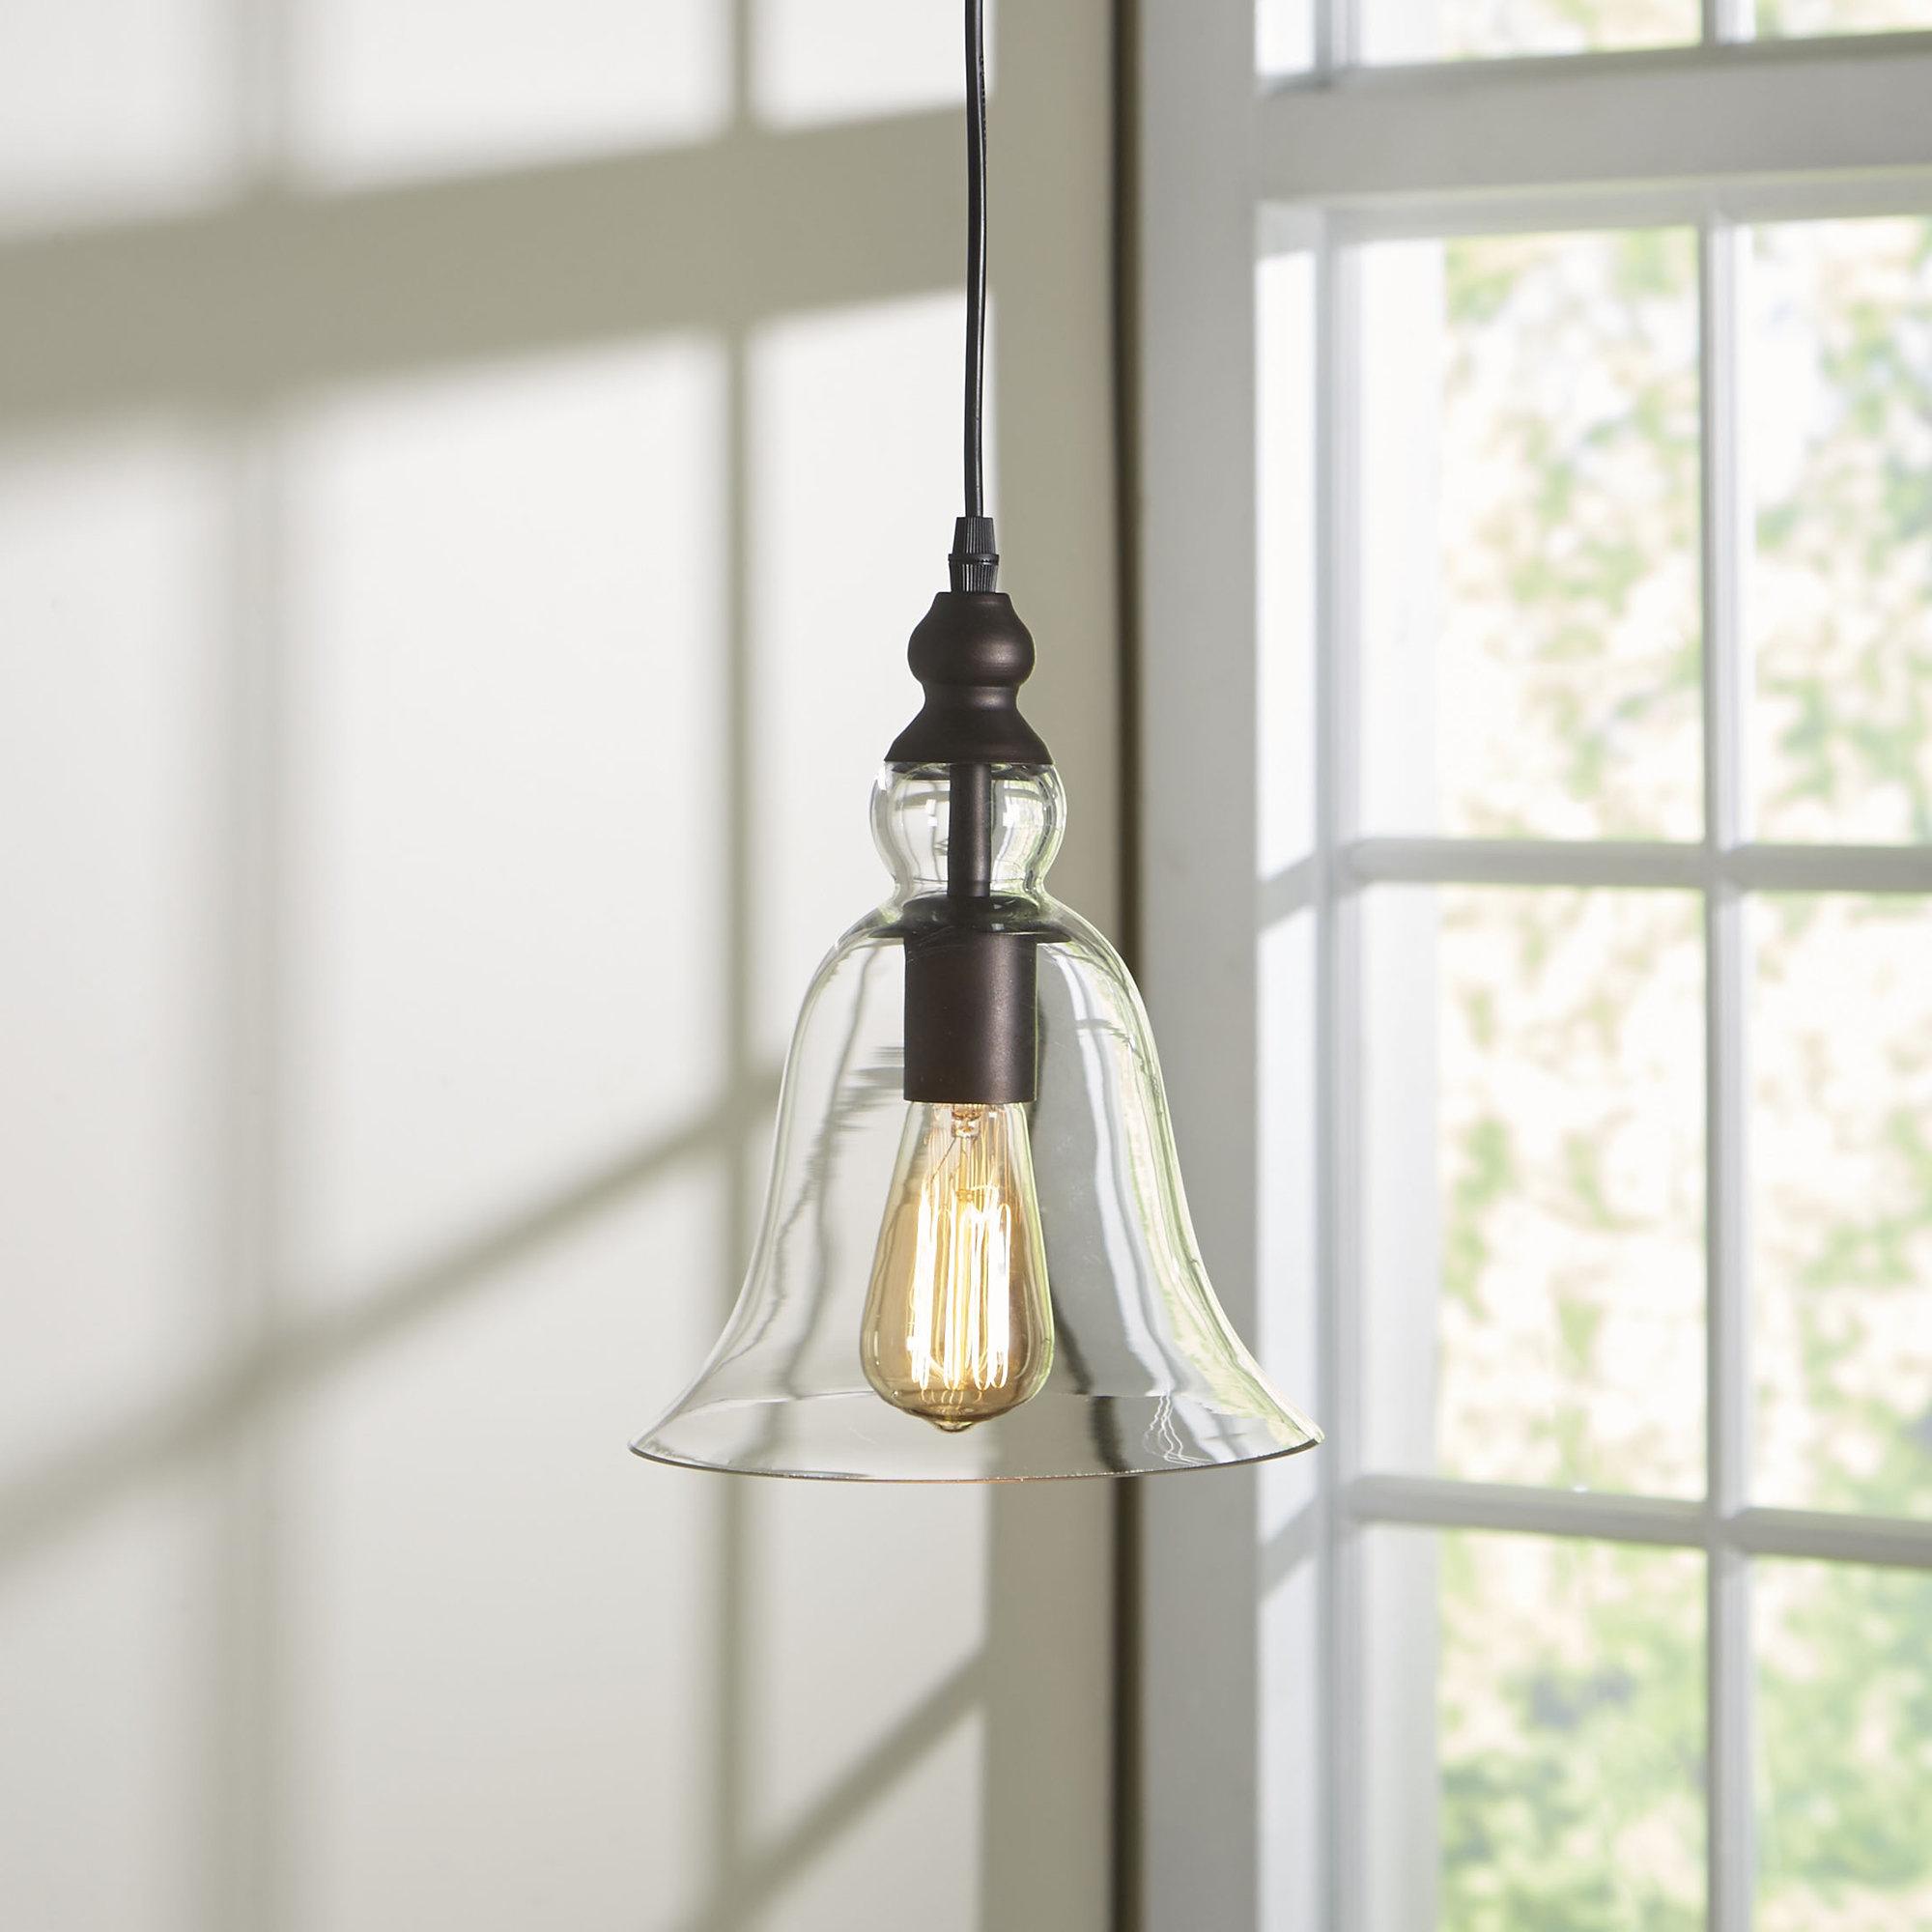 Bouvet 1 Light Bell Pendant Intended For Current Carey 1 Light Single Bell Pendants (View 3 of 20)